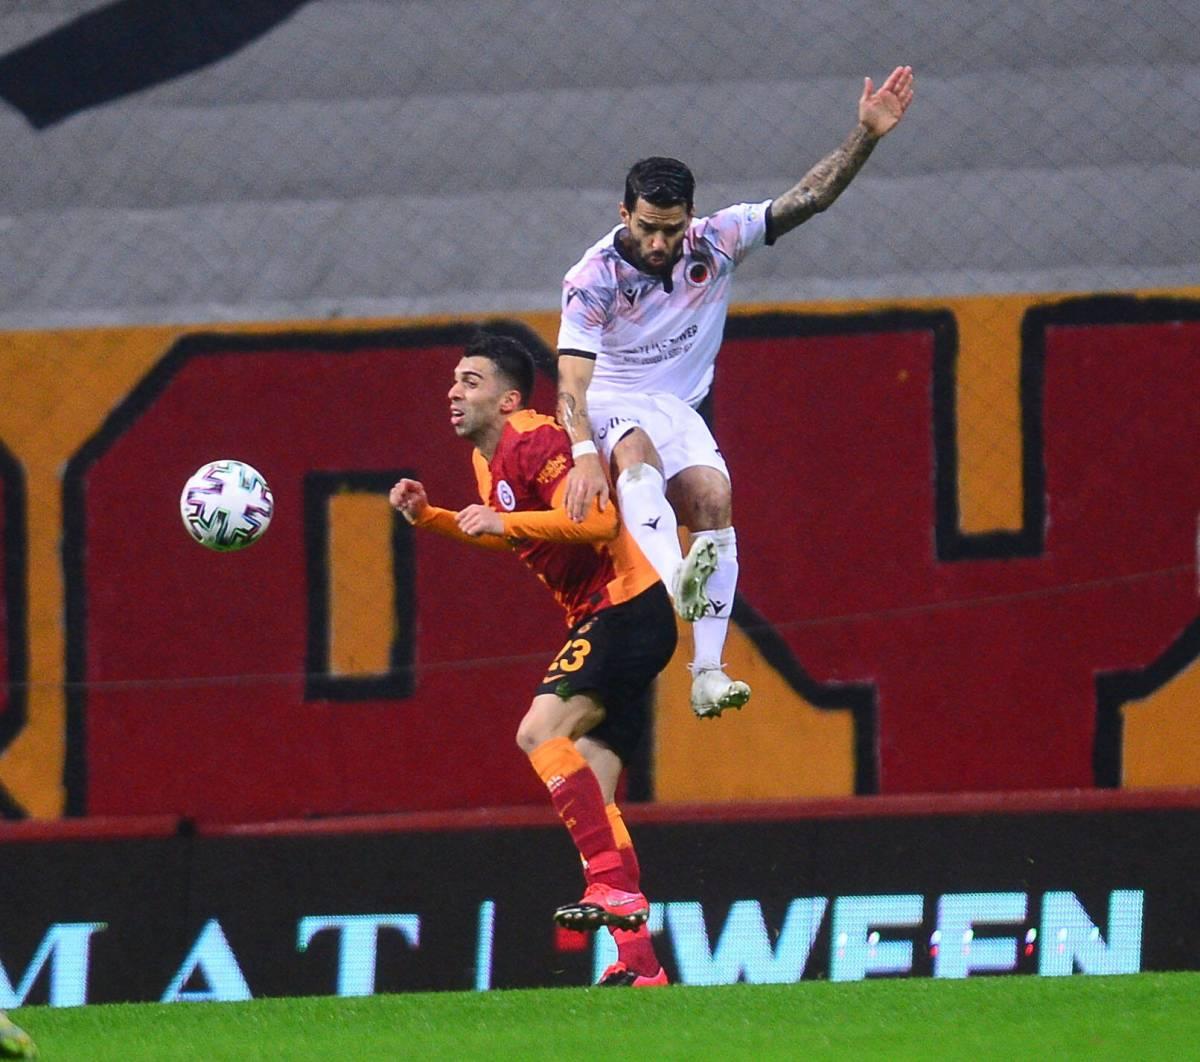 Генчлербирлиги - Малатьяспор: Прогноз и ставка на матч чемпионата Турции